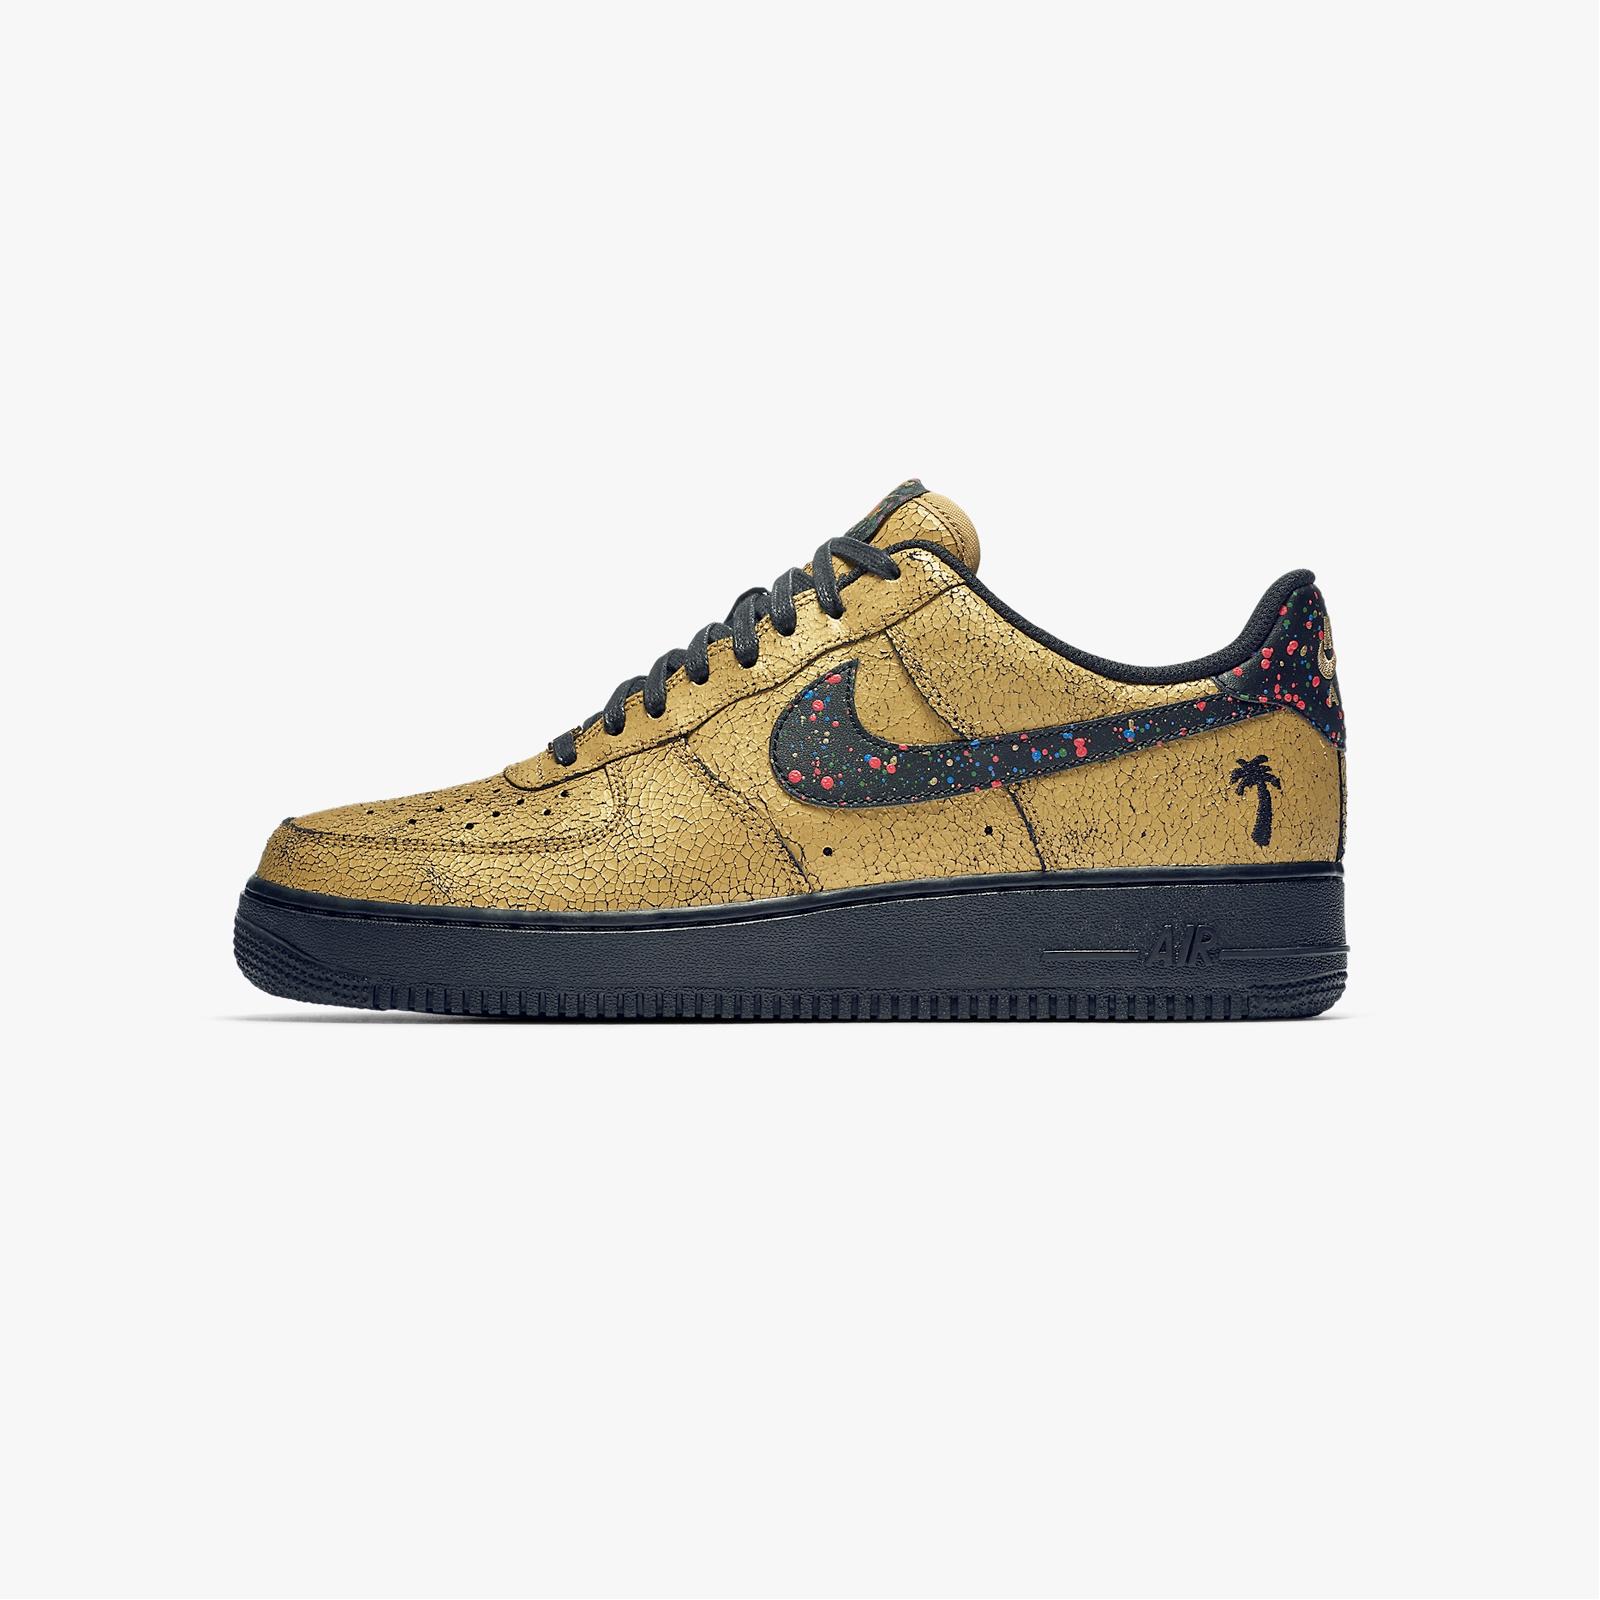 Nike AIR Force 1 '07 Mens Fashion Sneakers AV3219